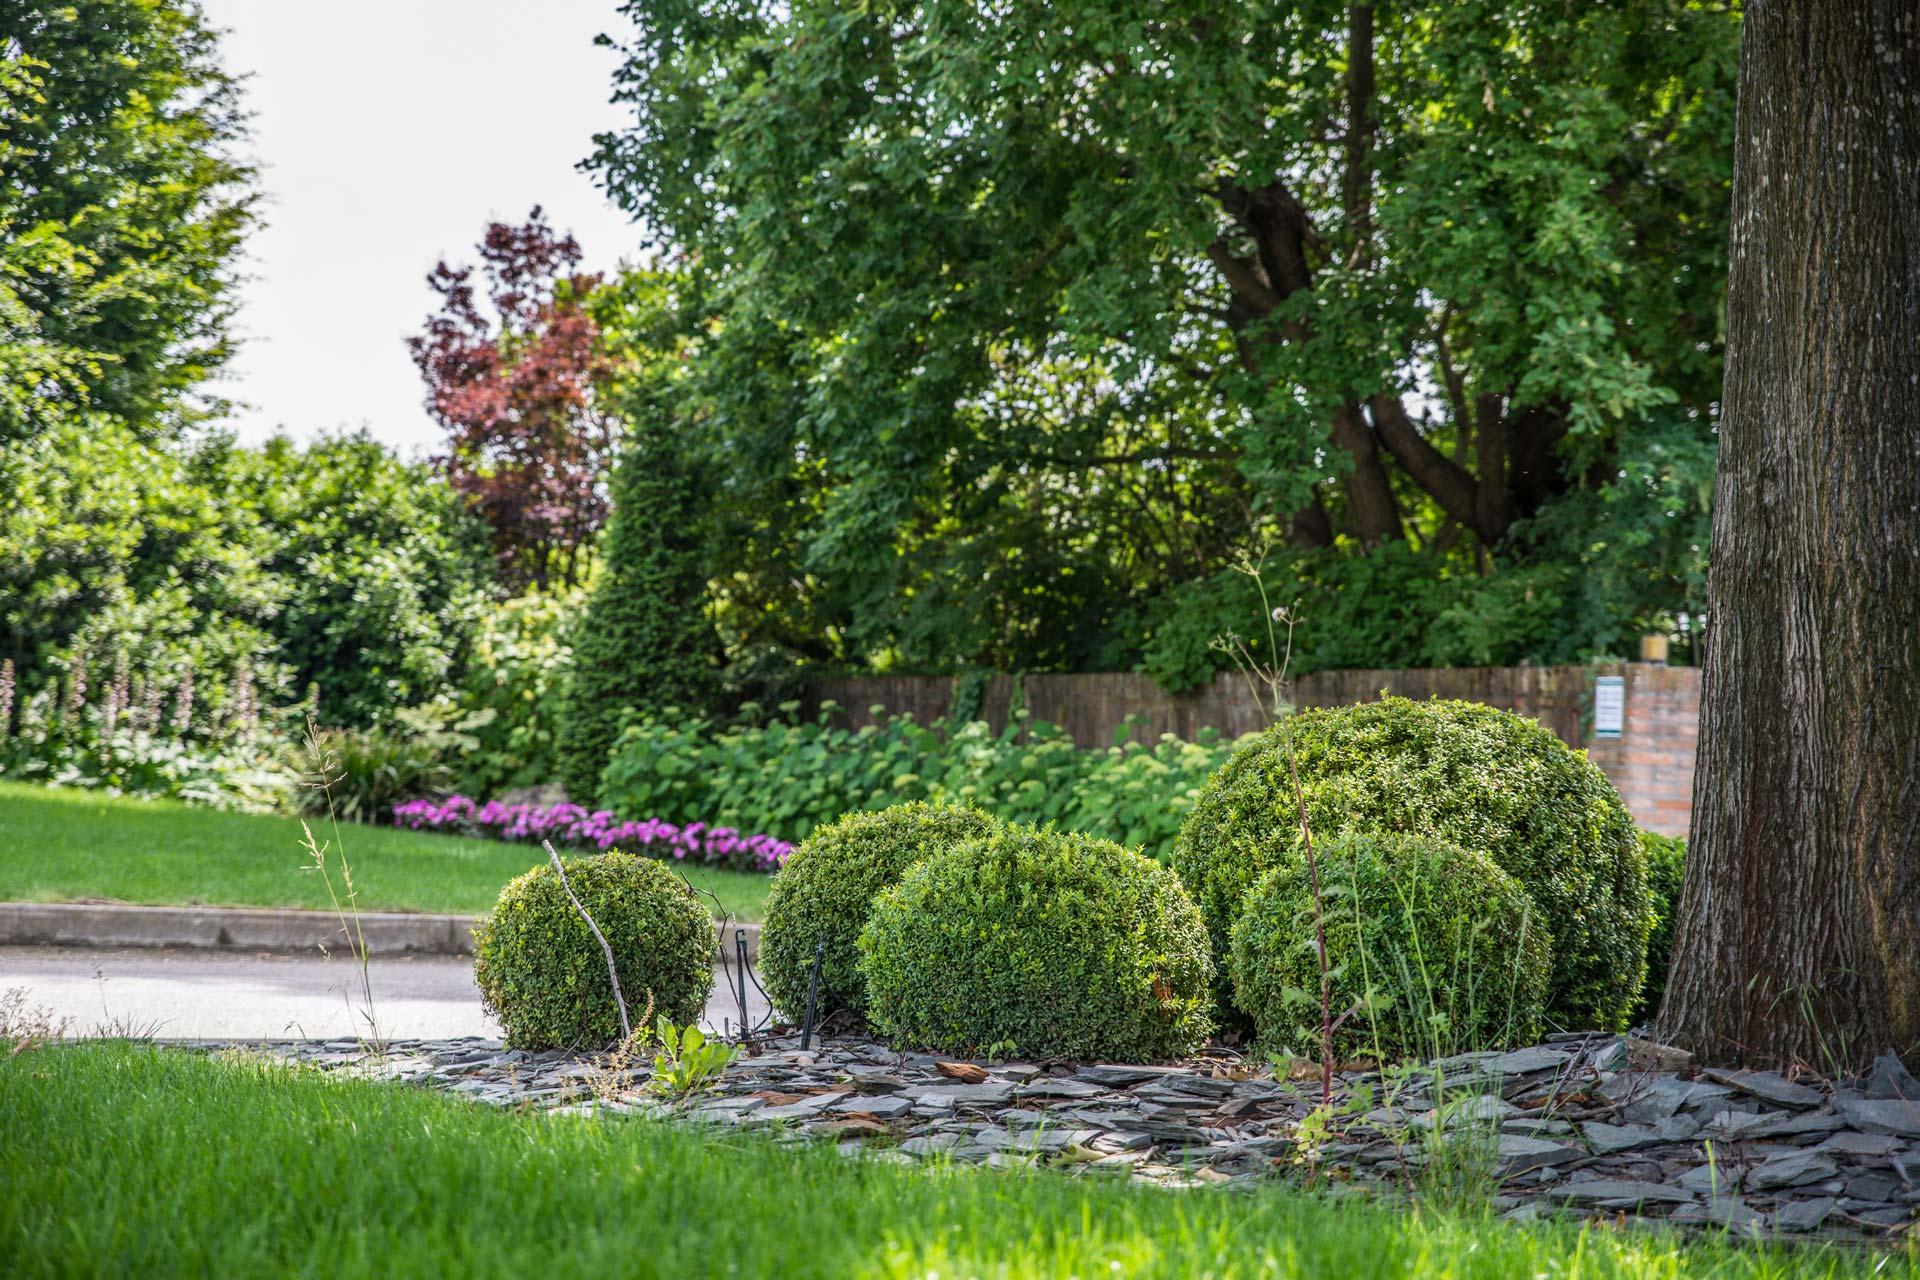 https://www.salmasogarden.it/wp-content/uploads/2020/11/foto-dettaglio-giardino-con-aiuola.jpg